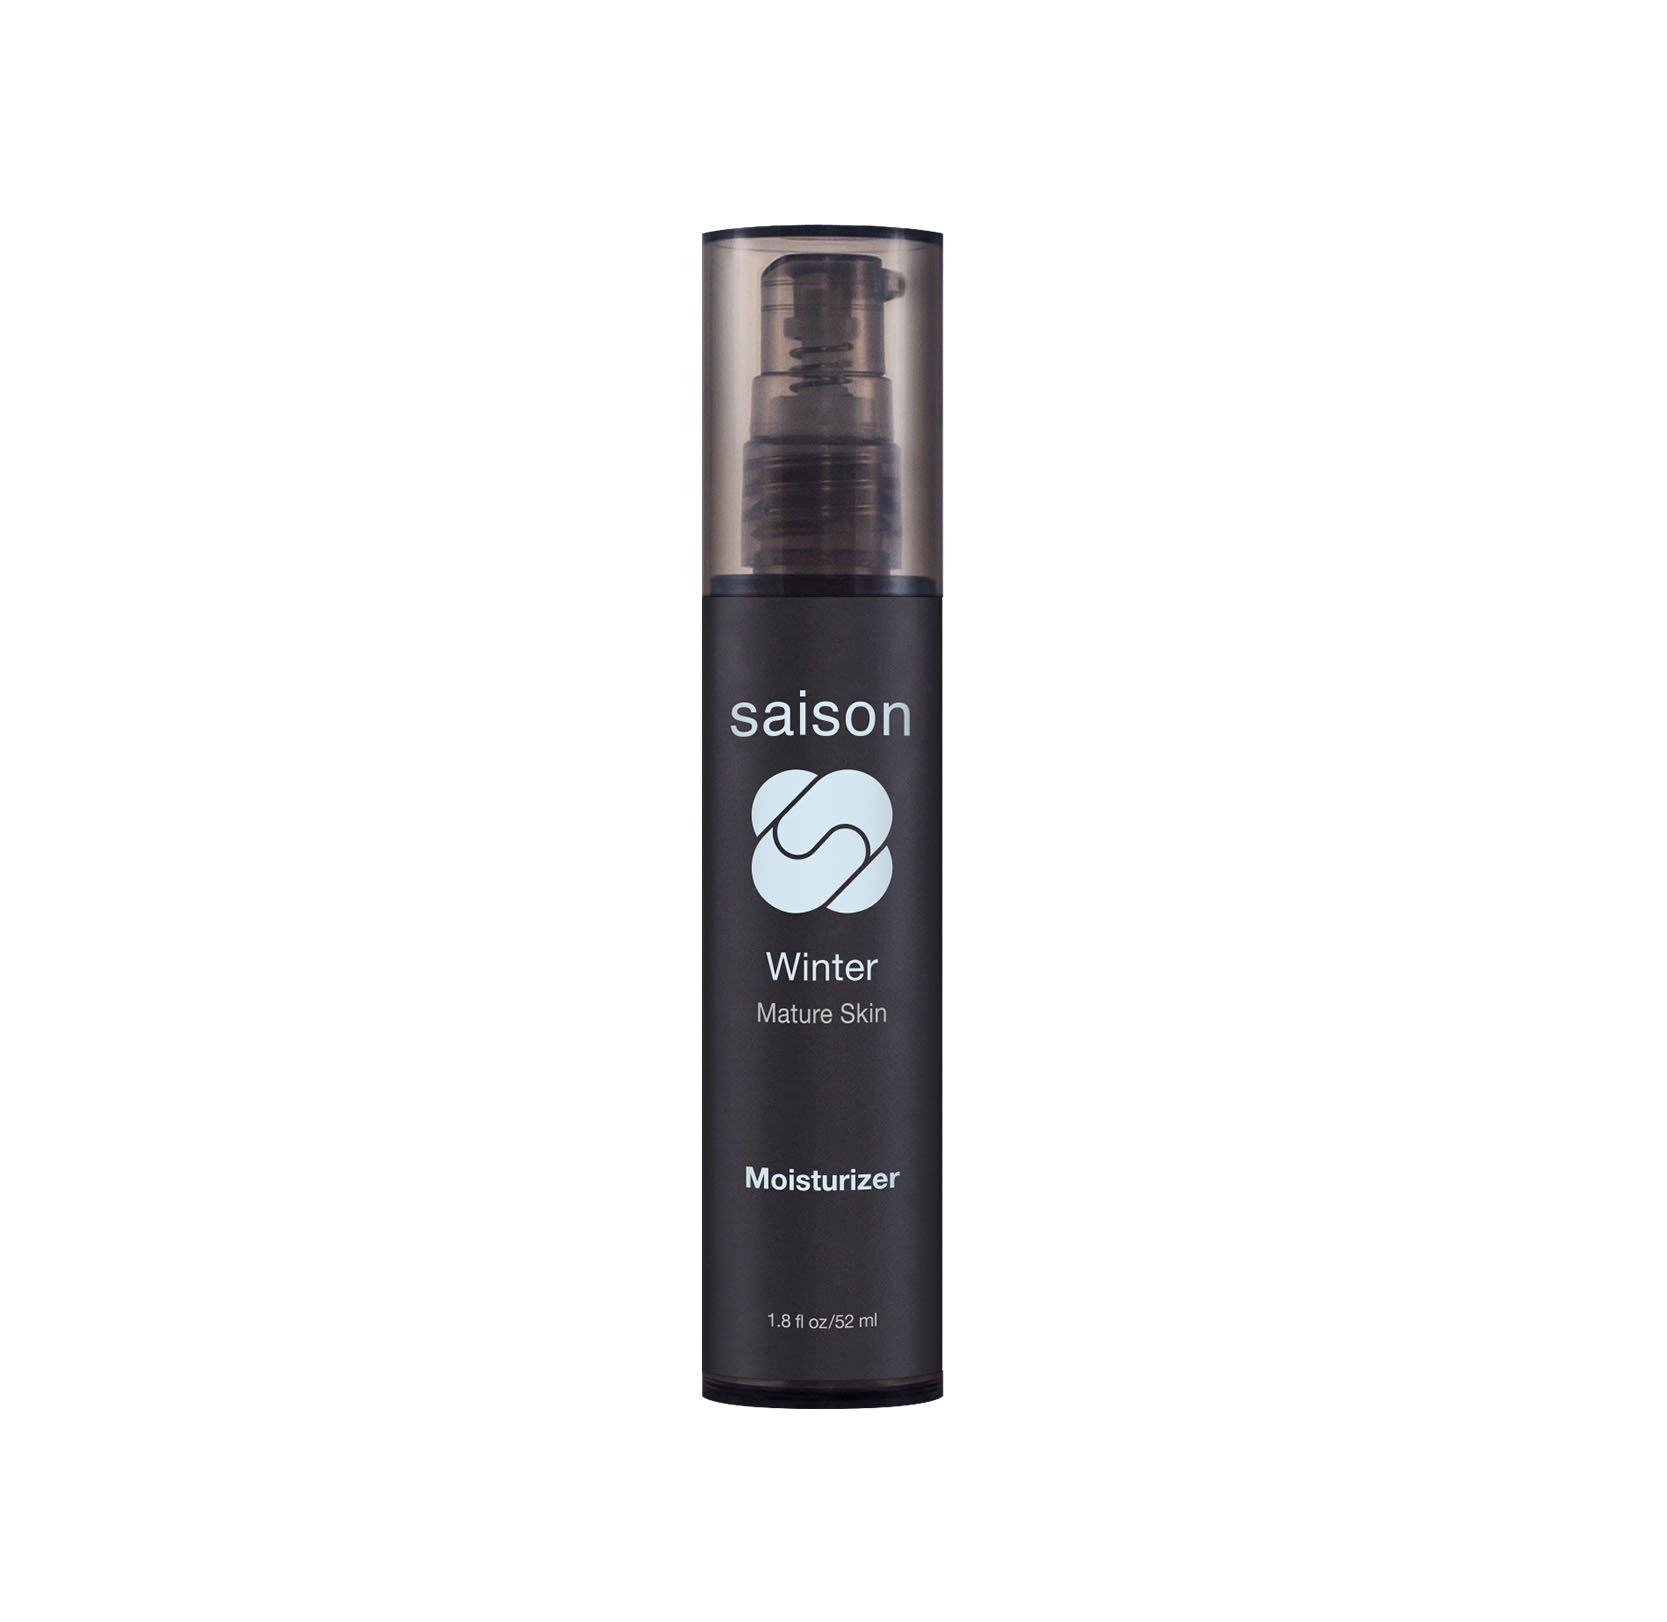 Saison Winter Moisturizer   Organic, Natural, Vegan & Cruelty Free Beauty   Good for Mature Skin